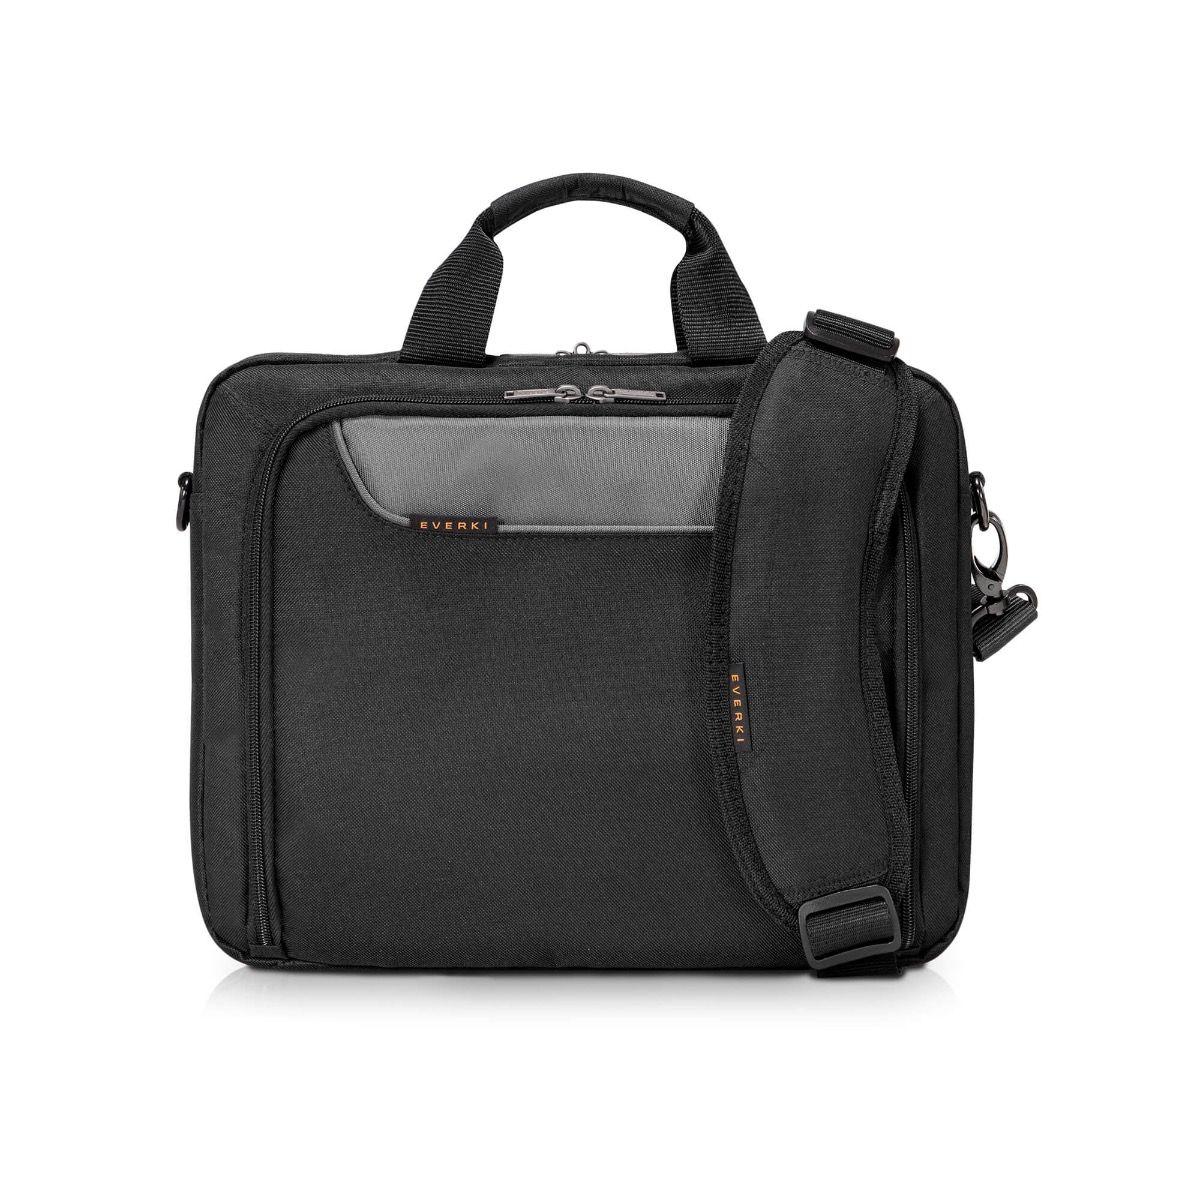 EVERKI Advance 14 Inch Laptop Briefcase